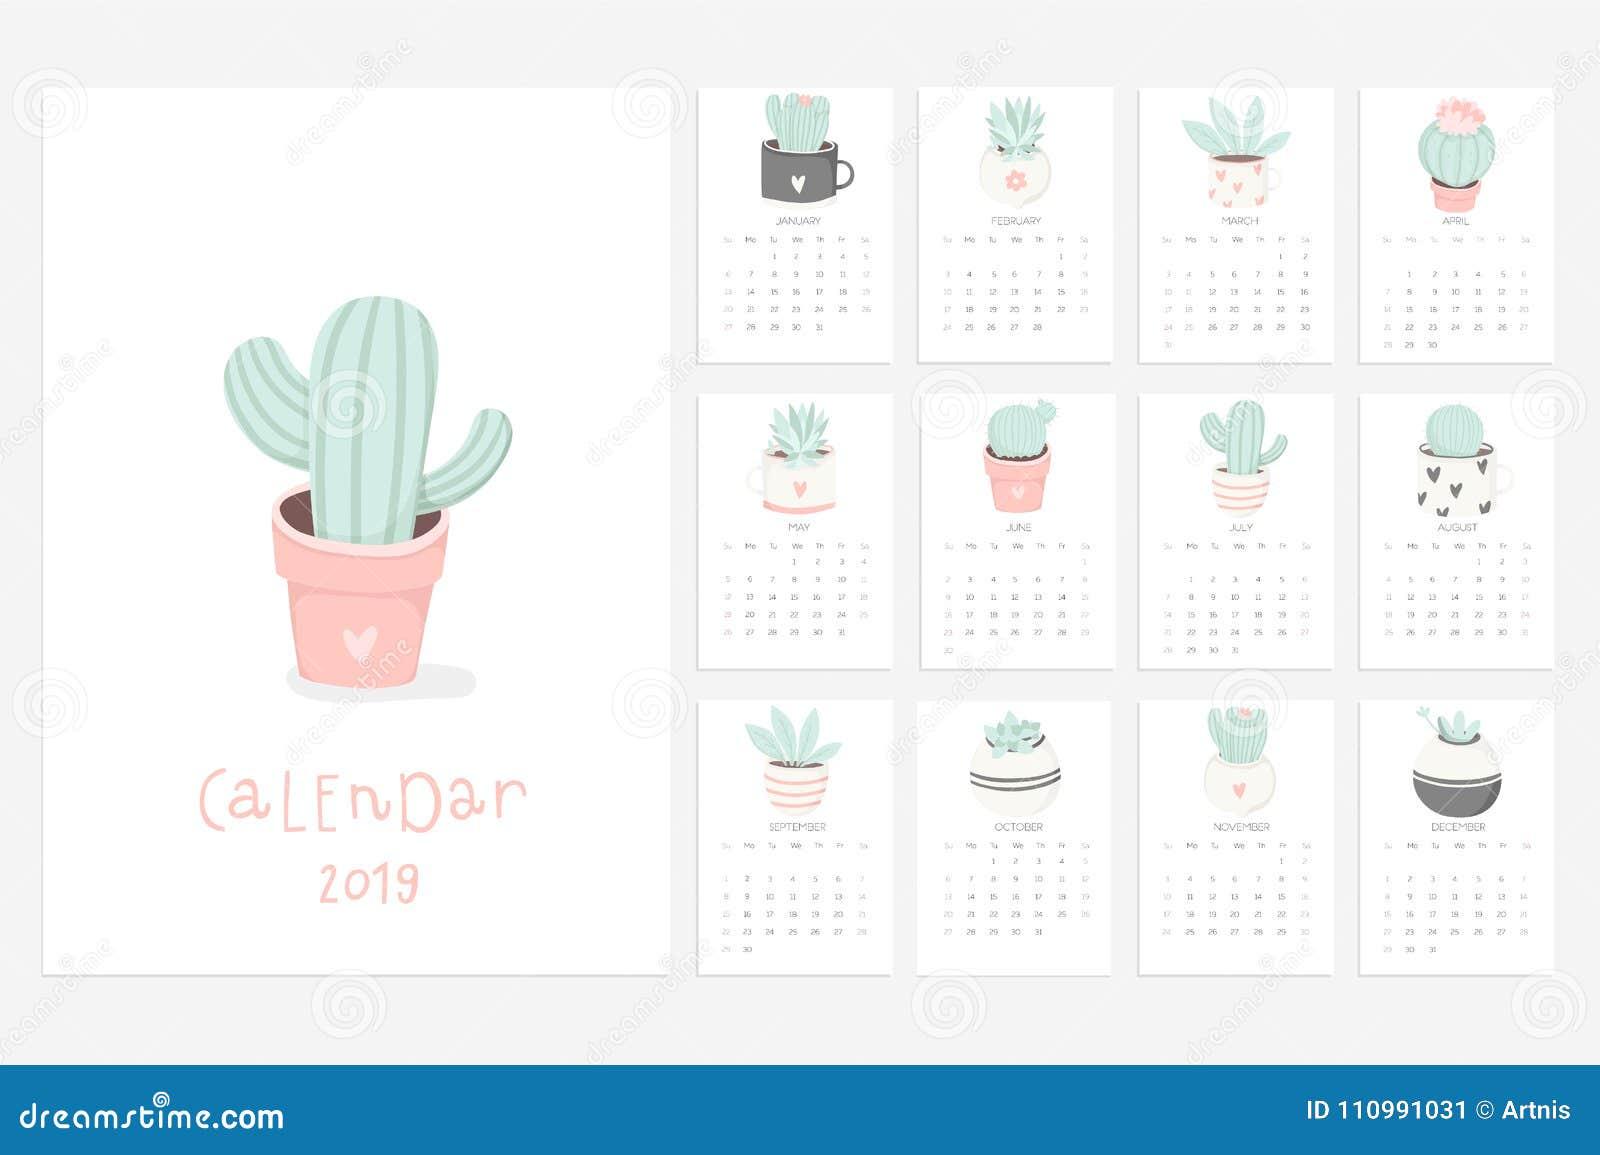 Fun 2019 Calendar Calendar 2019. Fun And Cute Calendar With Hand Drawn Succulents